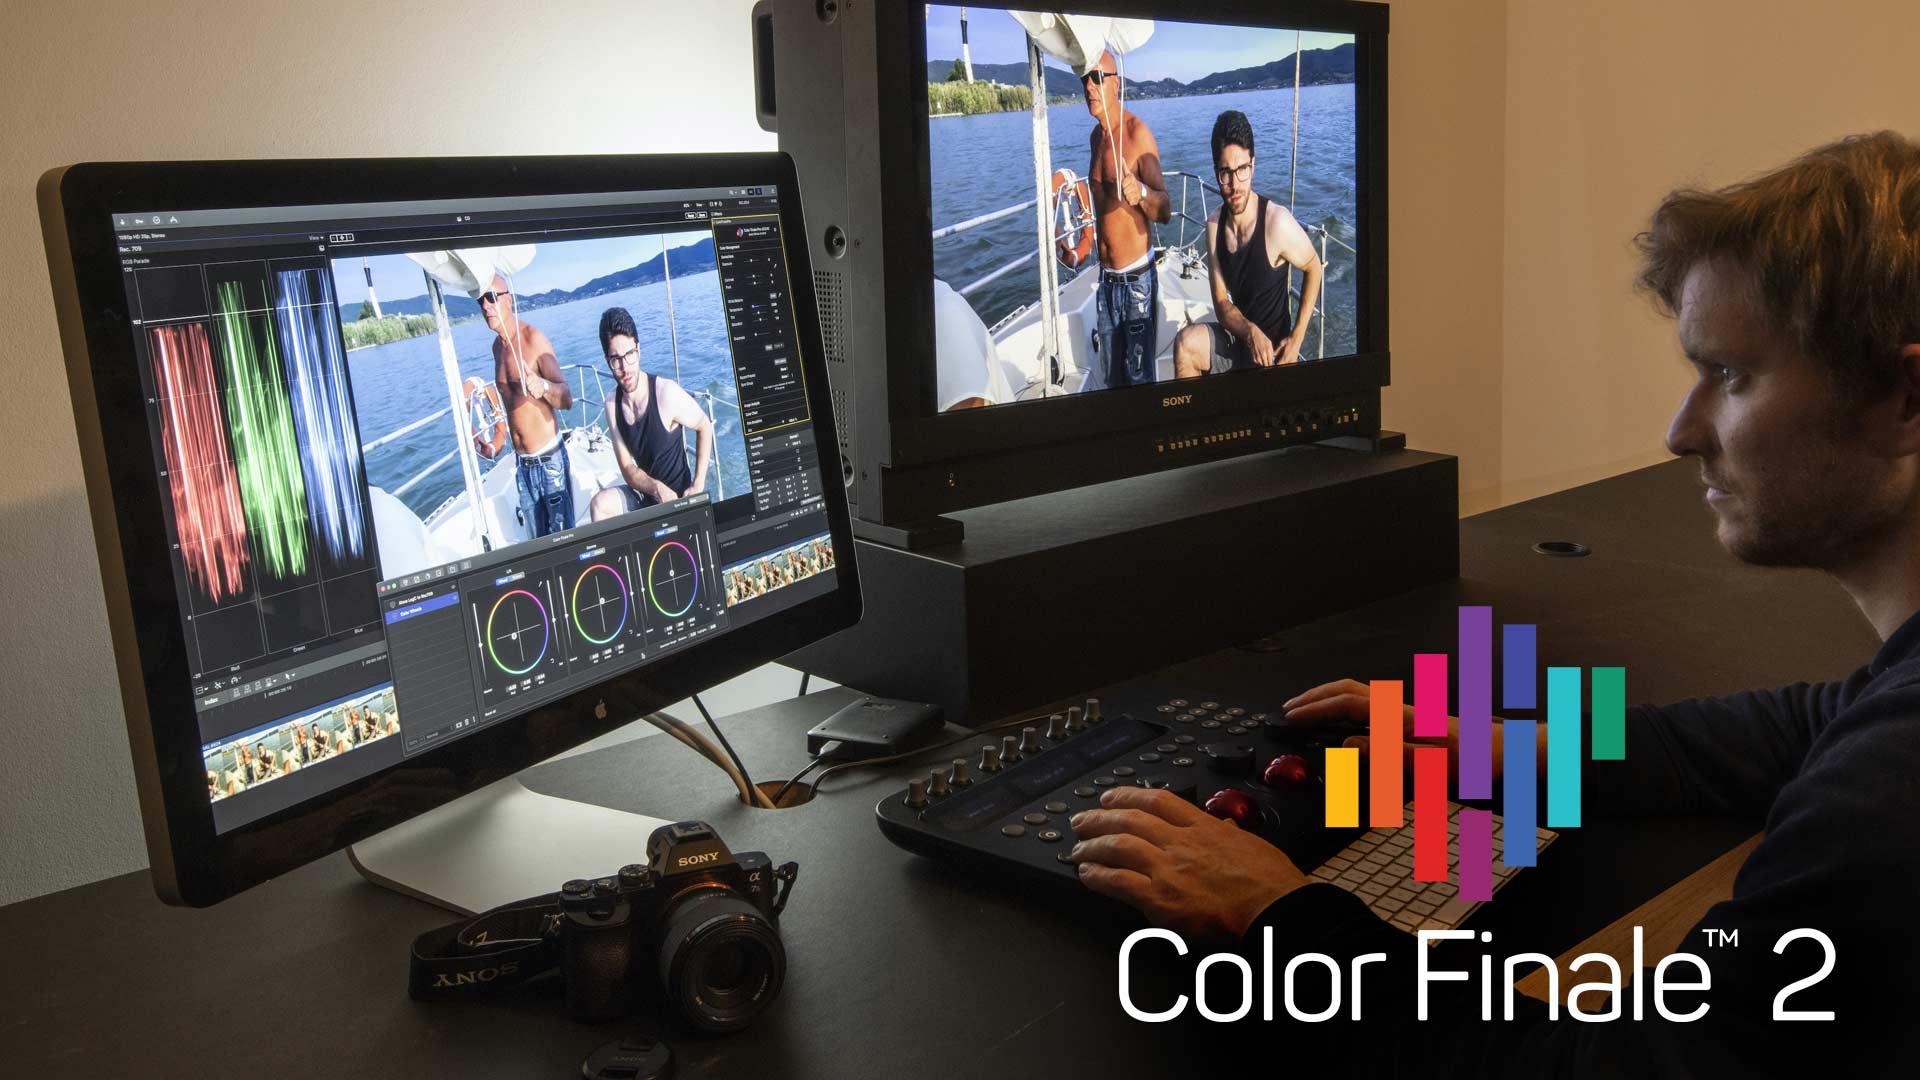 color finale 2 FCPX banner